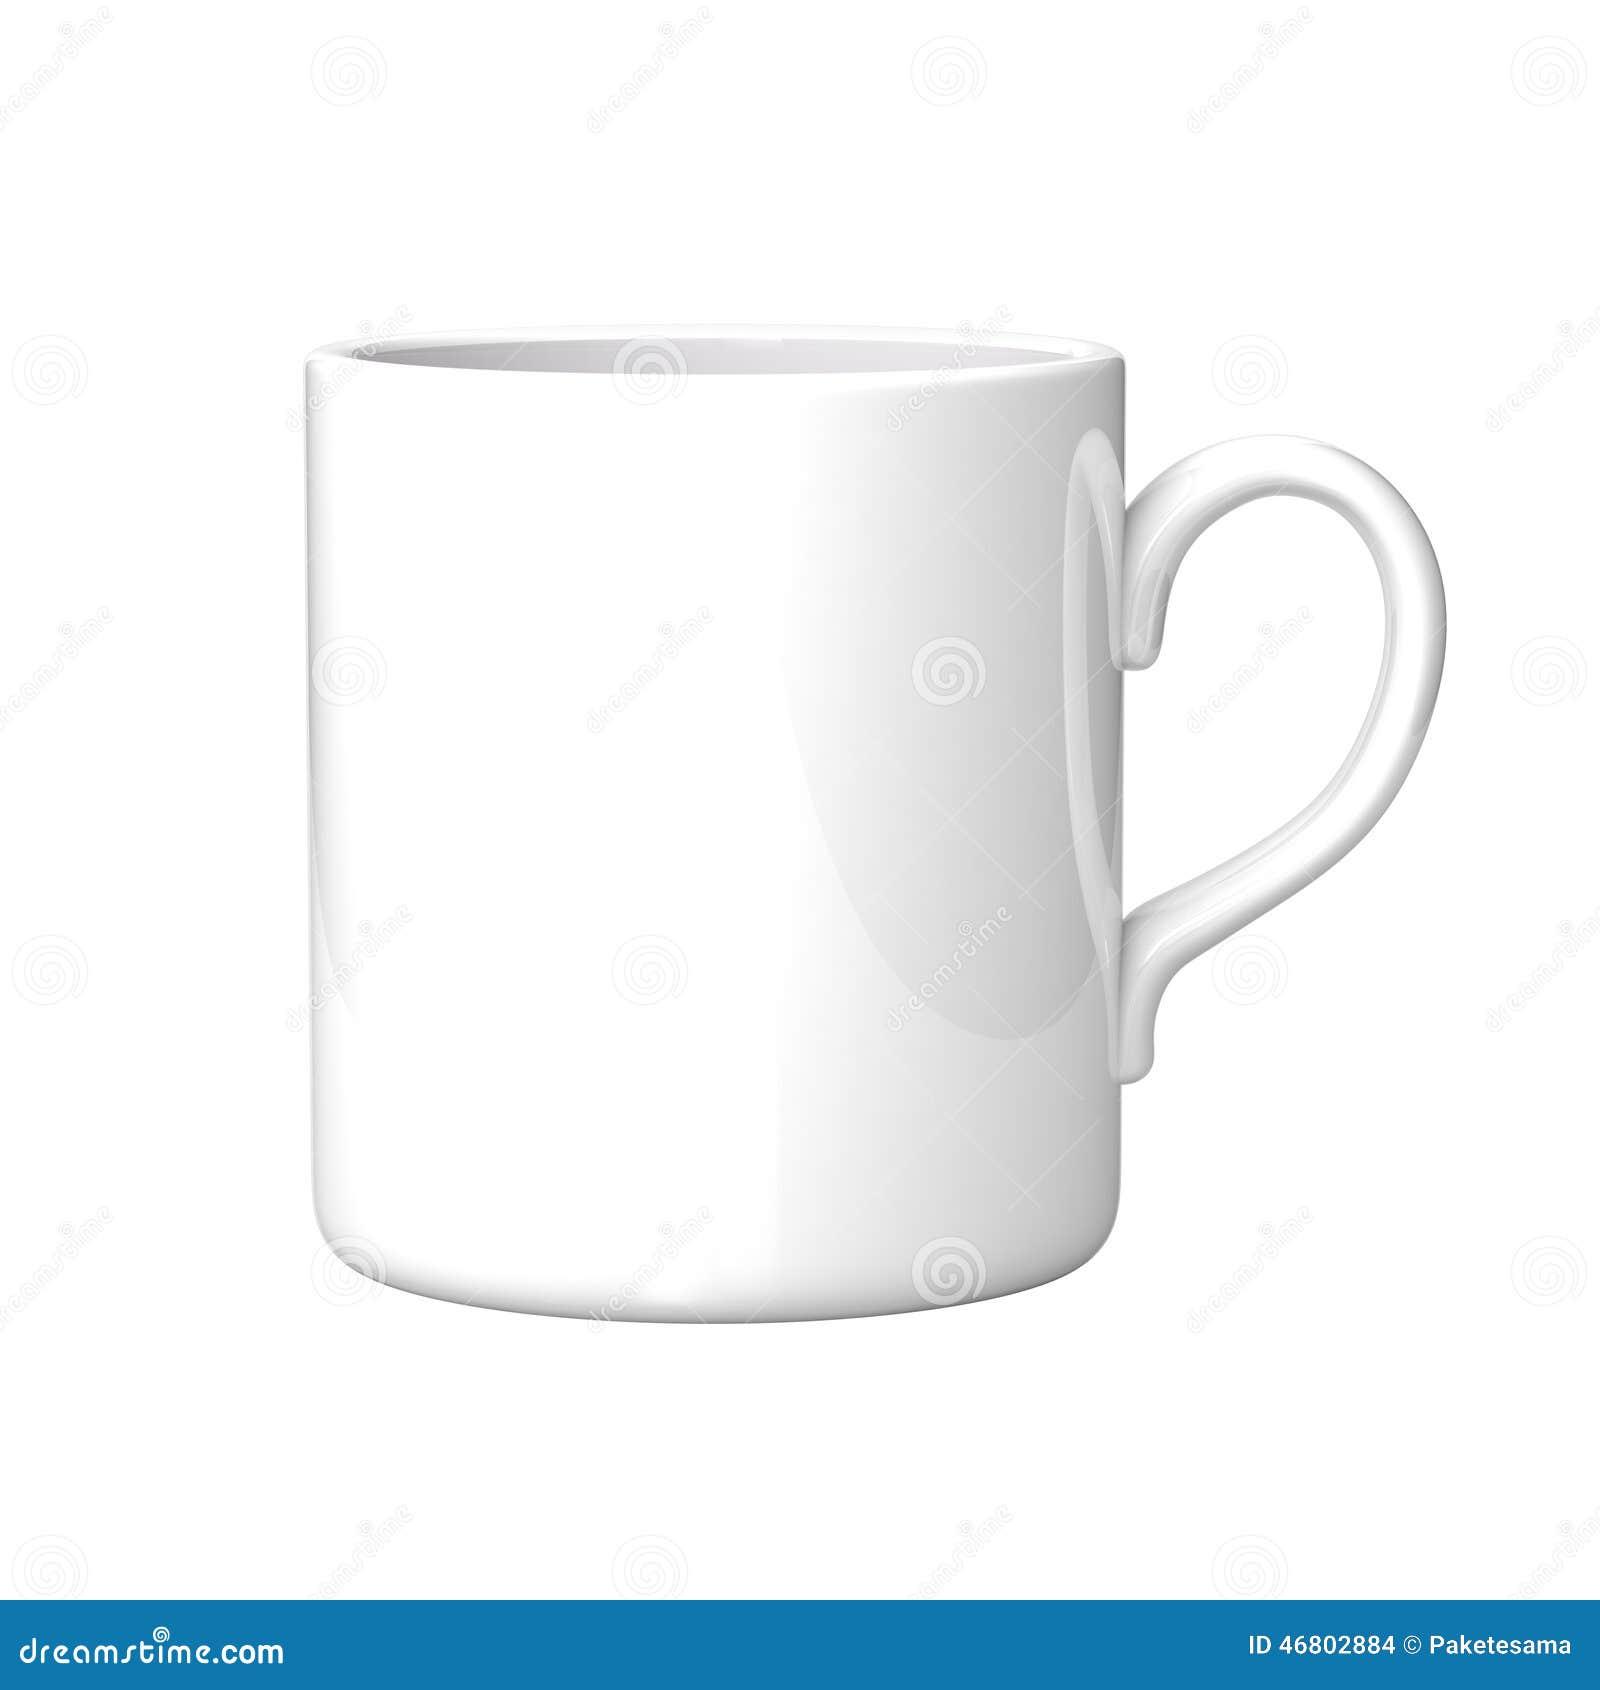 white coffee mug stock illustration illustration of brown 46802884. Black Bedroom Furniture Sets. Home Design Ideas